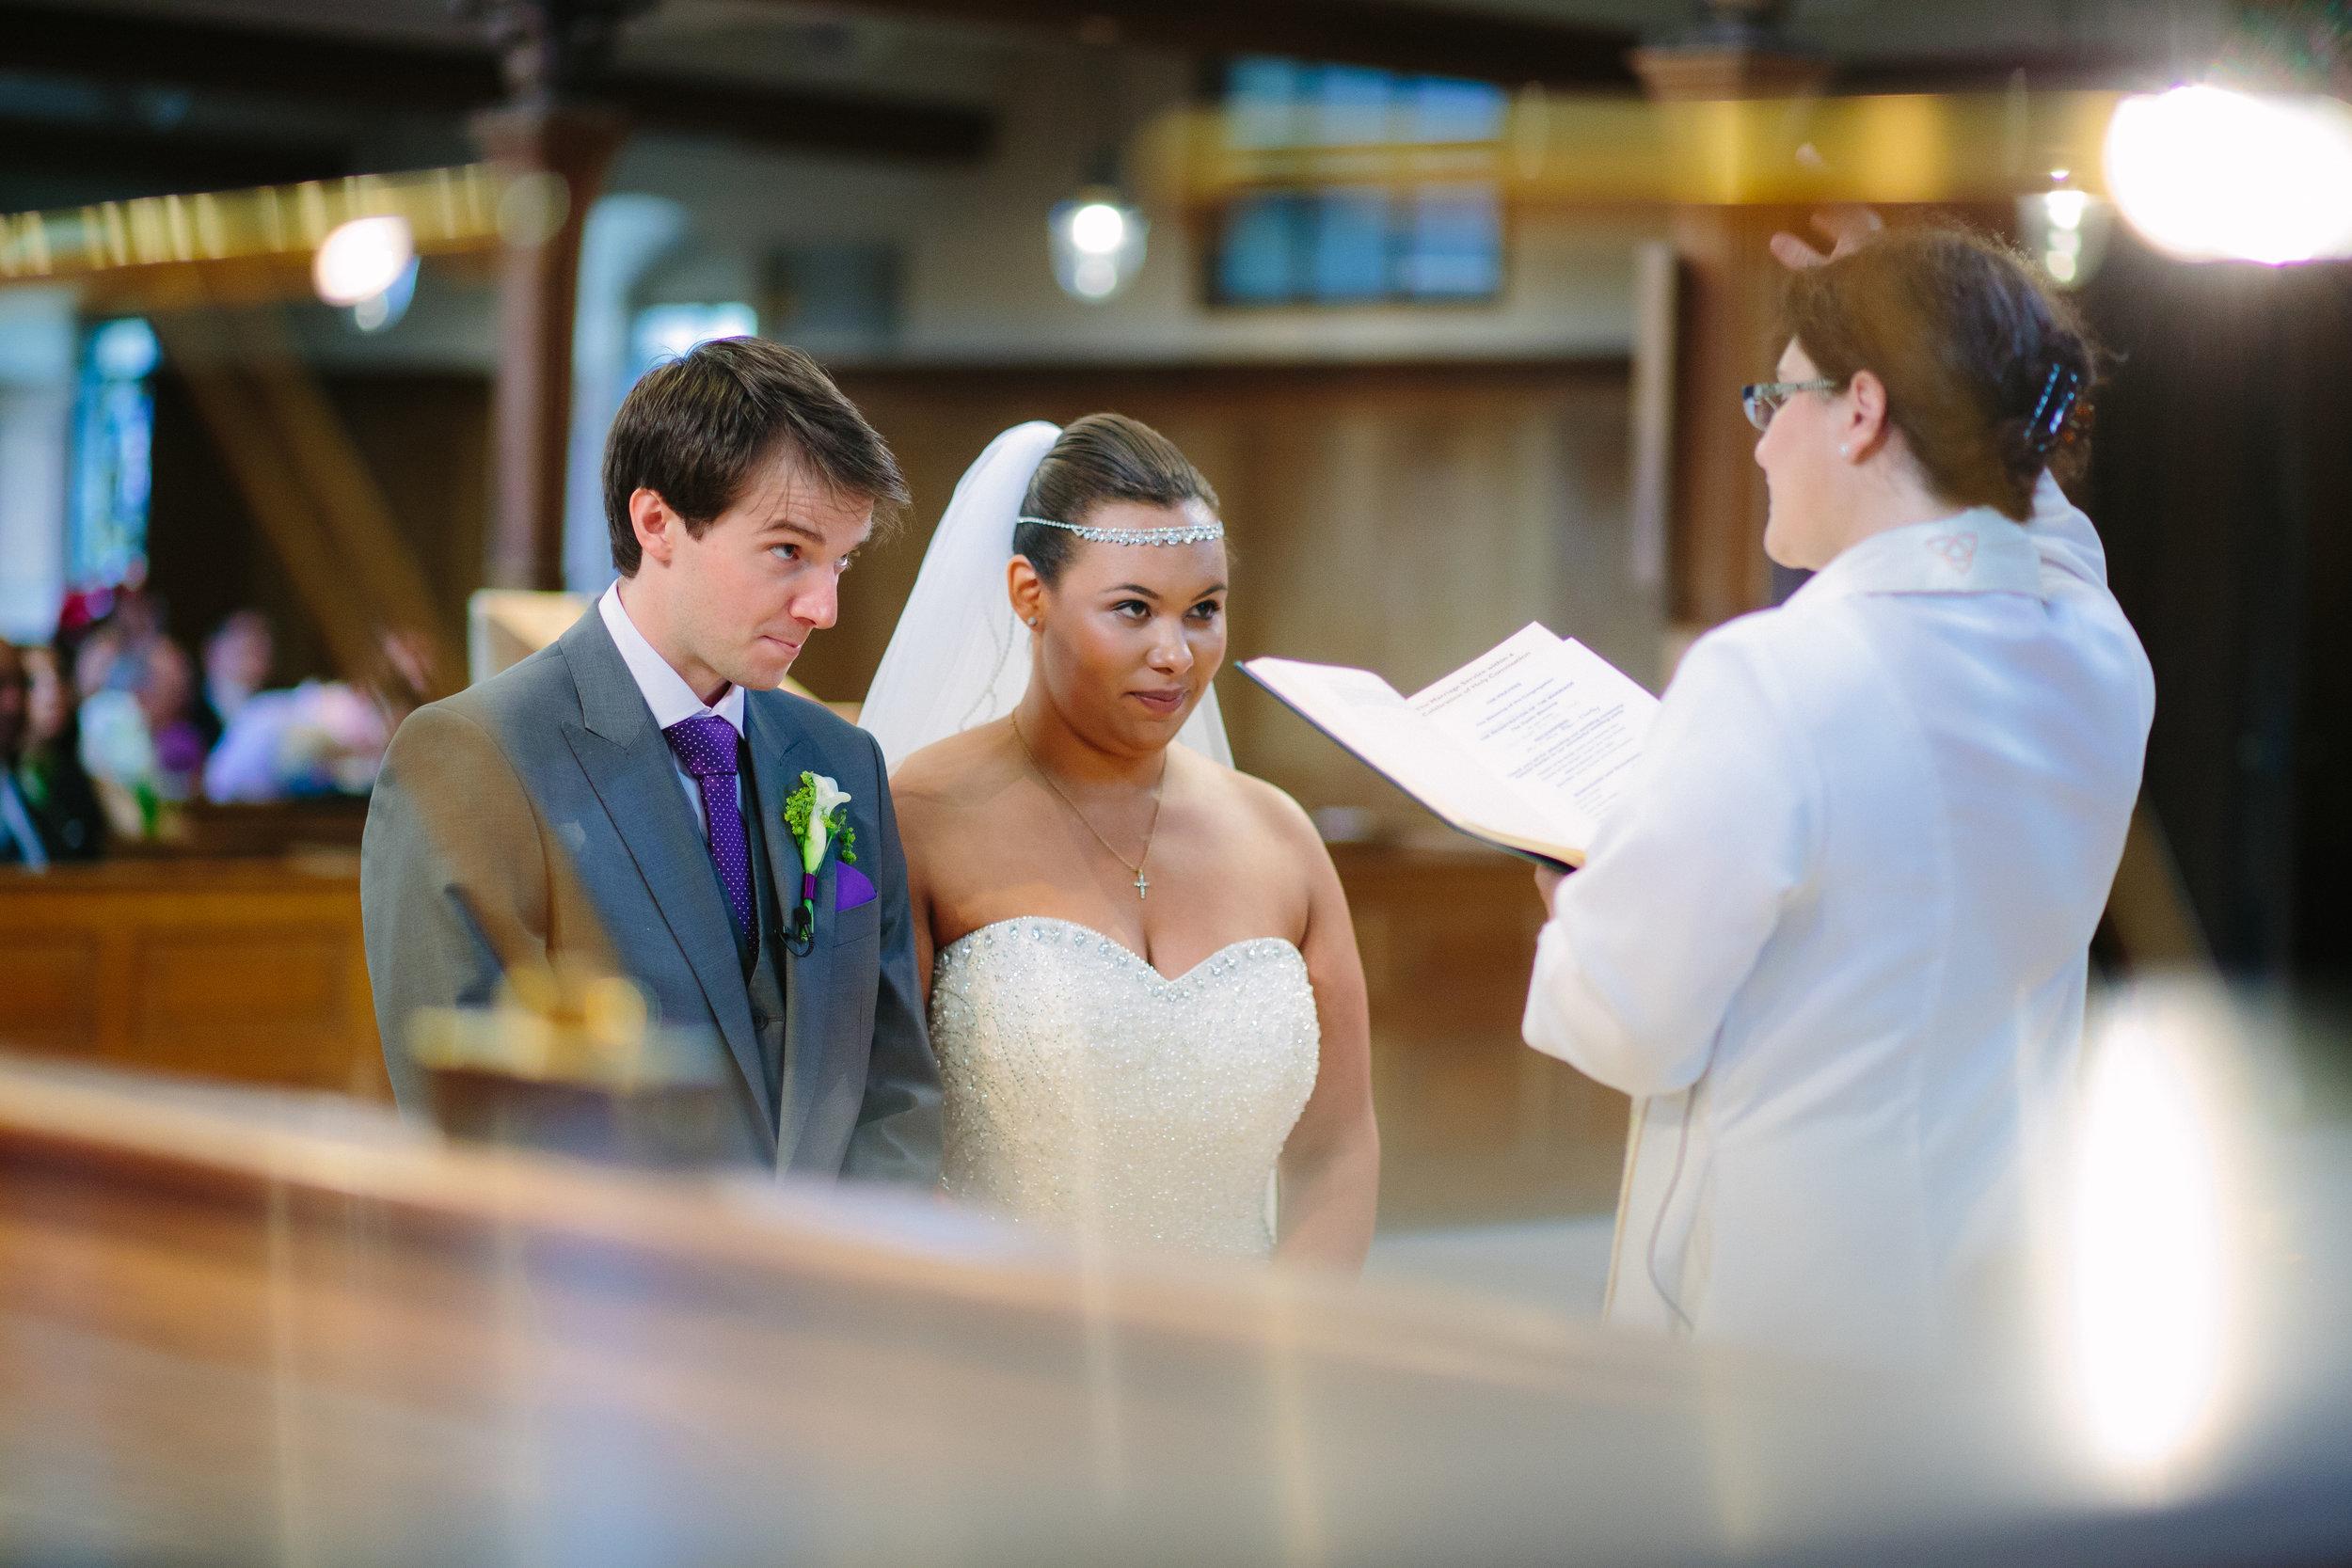 Saint-Alfege-Church-greenwich-wedding-charlton-london-blessing-140